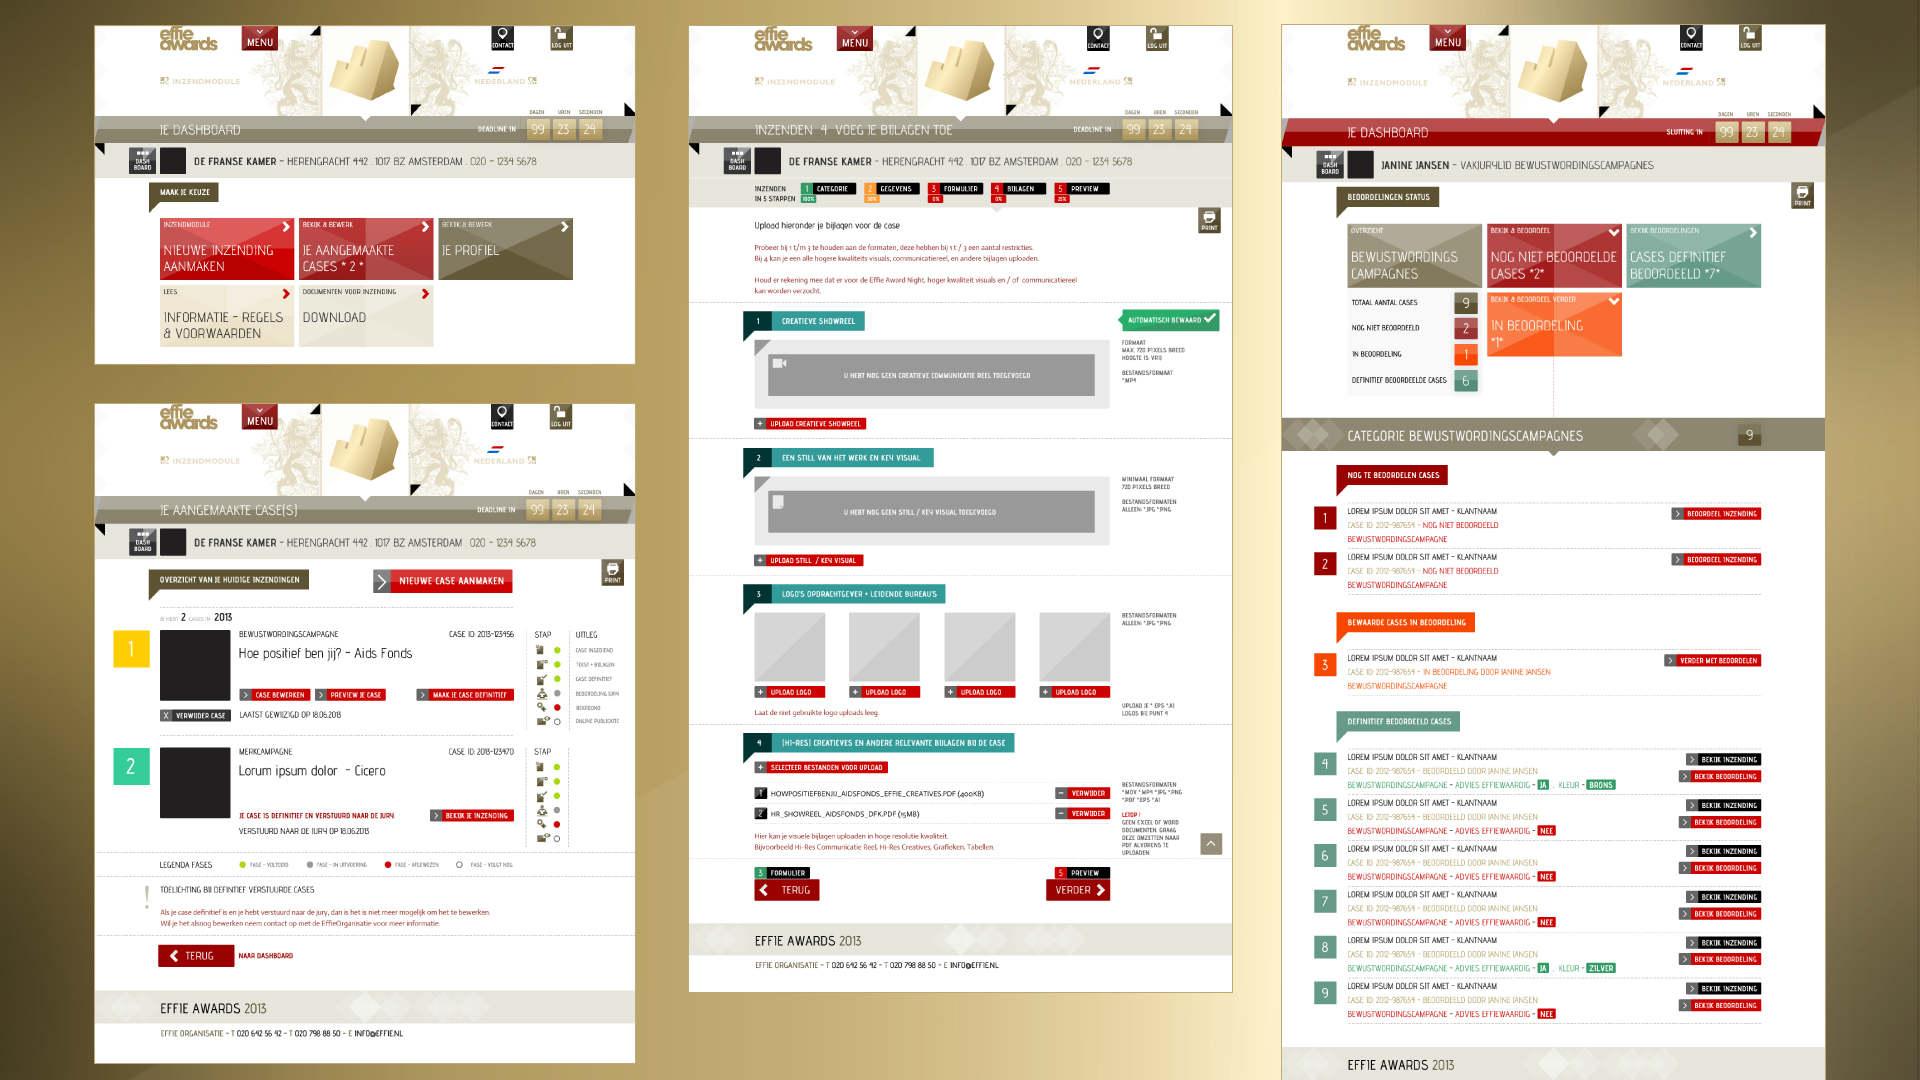 Effie Awards. Case. Visuals van rebranding, strategie, communicatie, identity, concept, social media, designs, event. Sham Ramessar